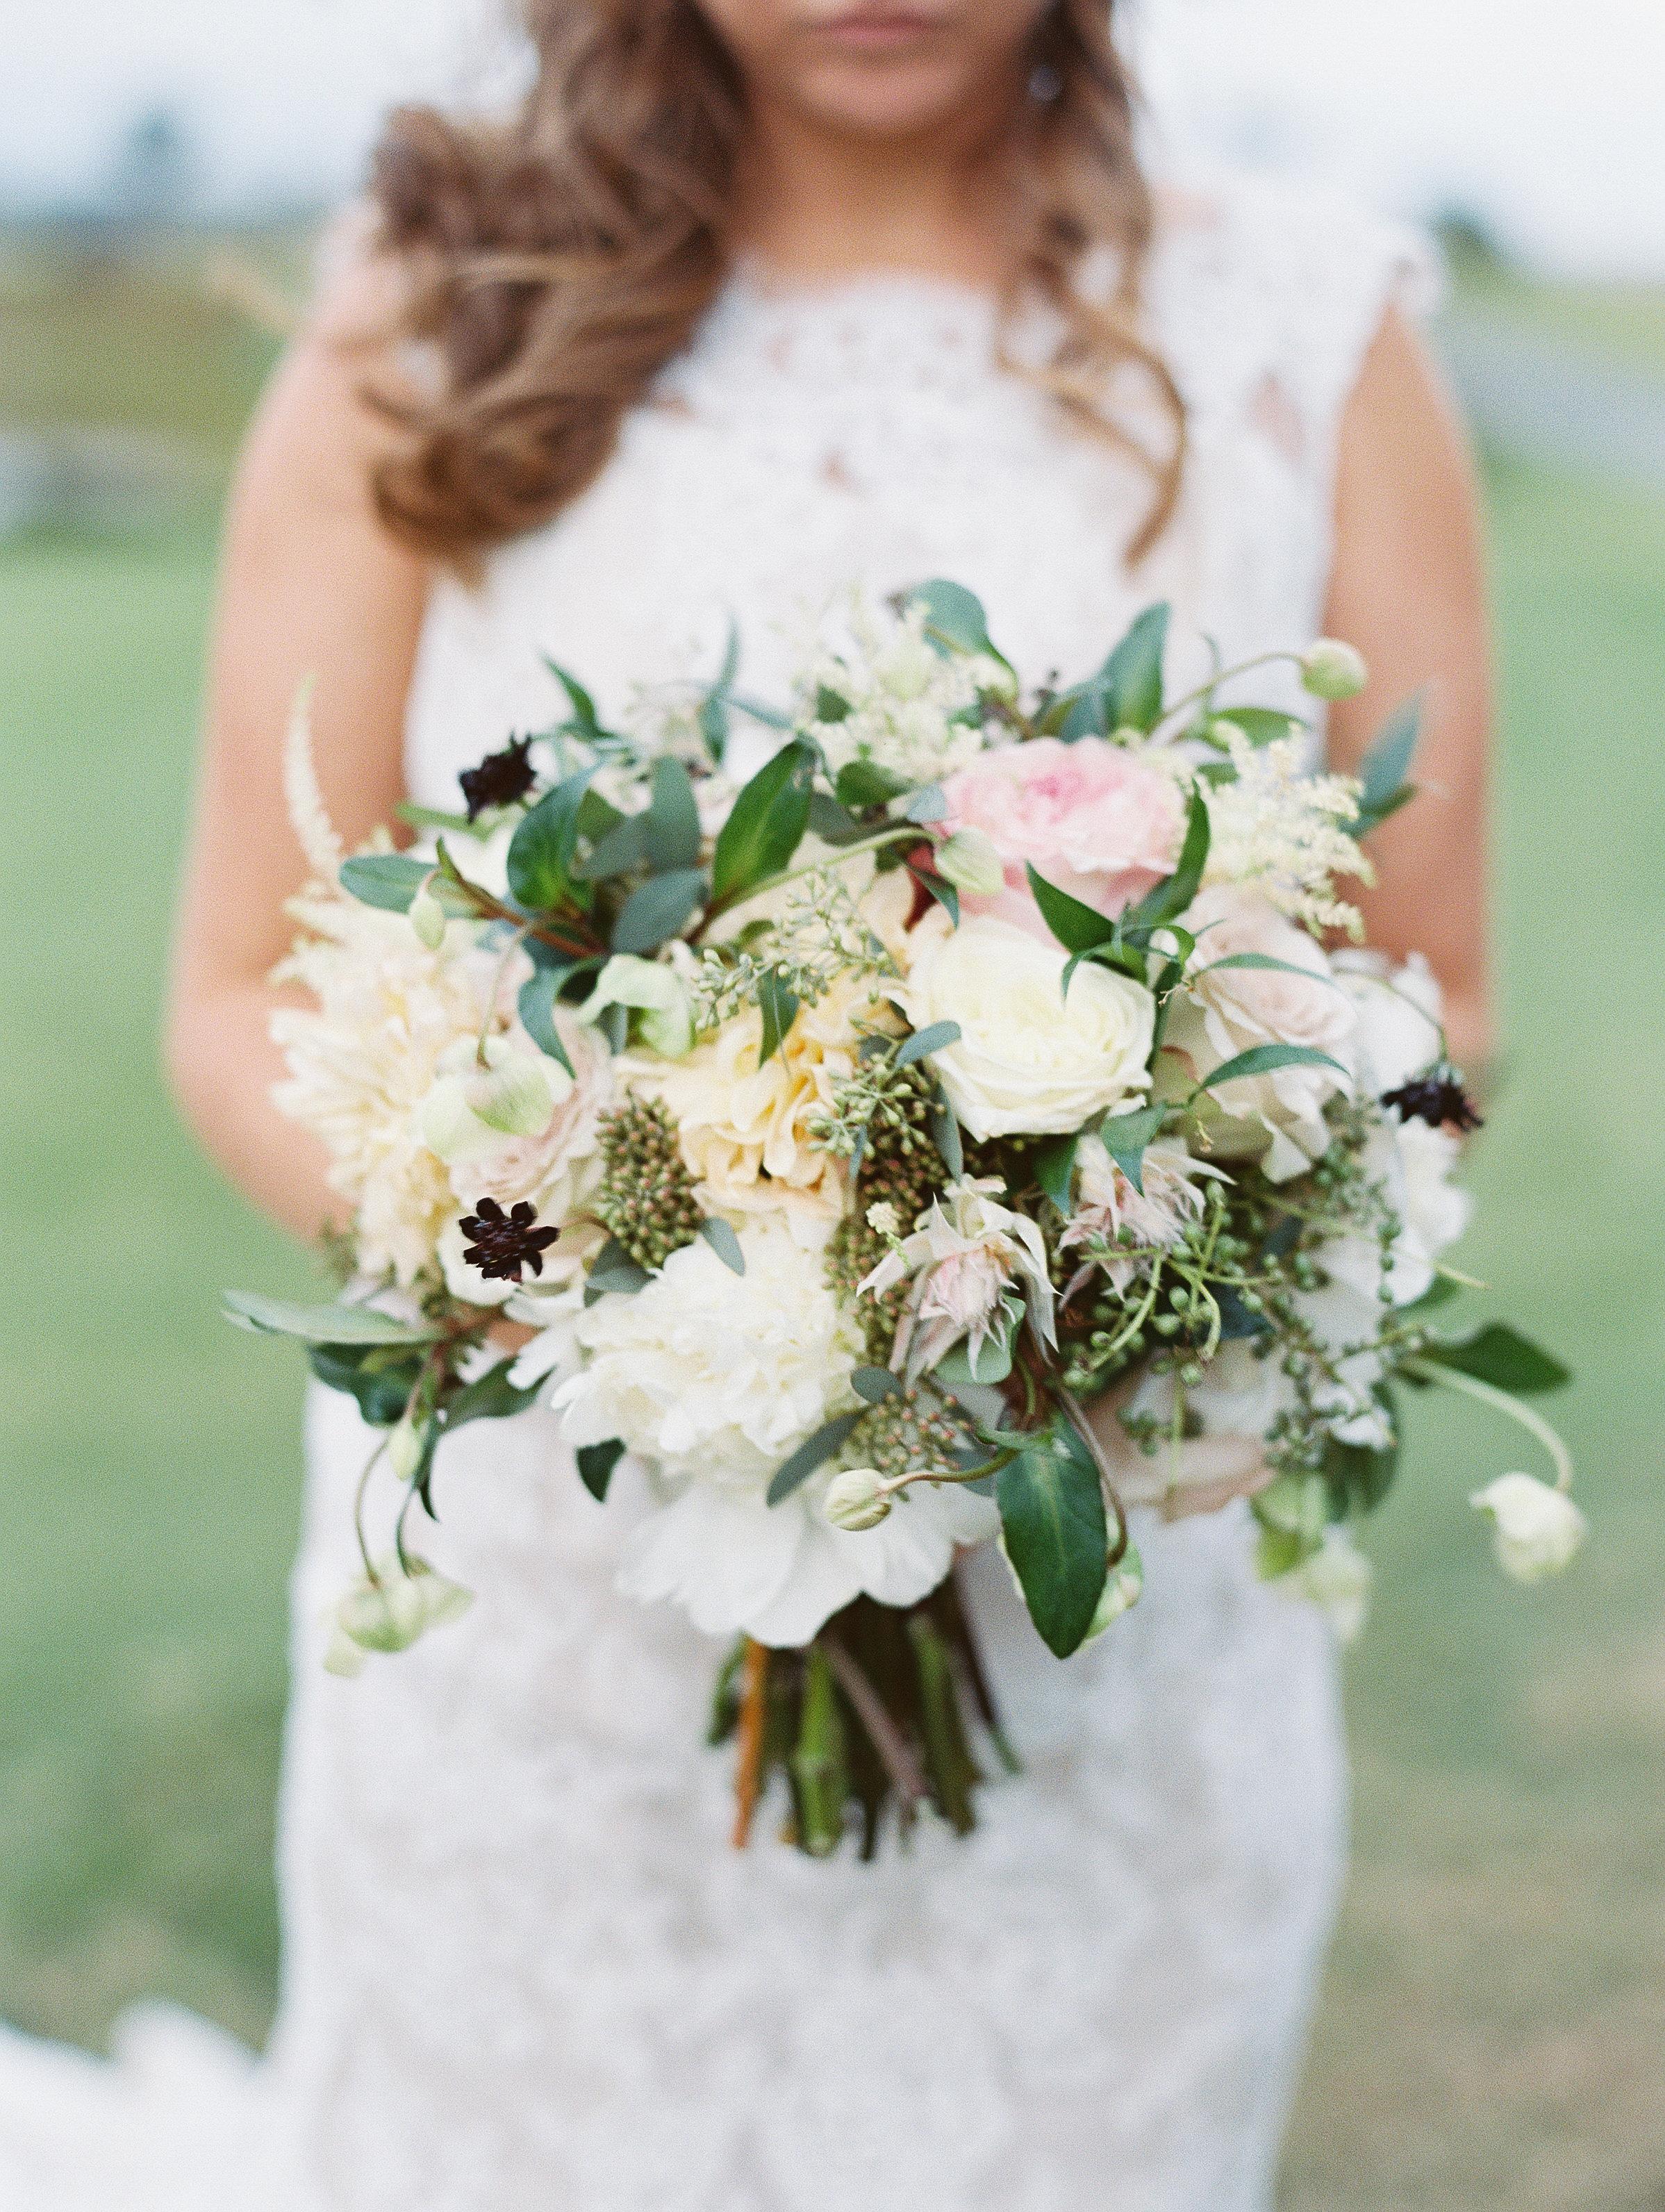 Fripp Island, South Carolina wedding by Landon Jacob Productions